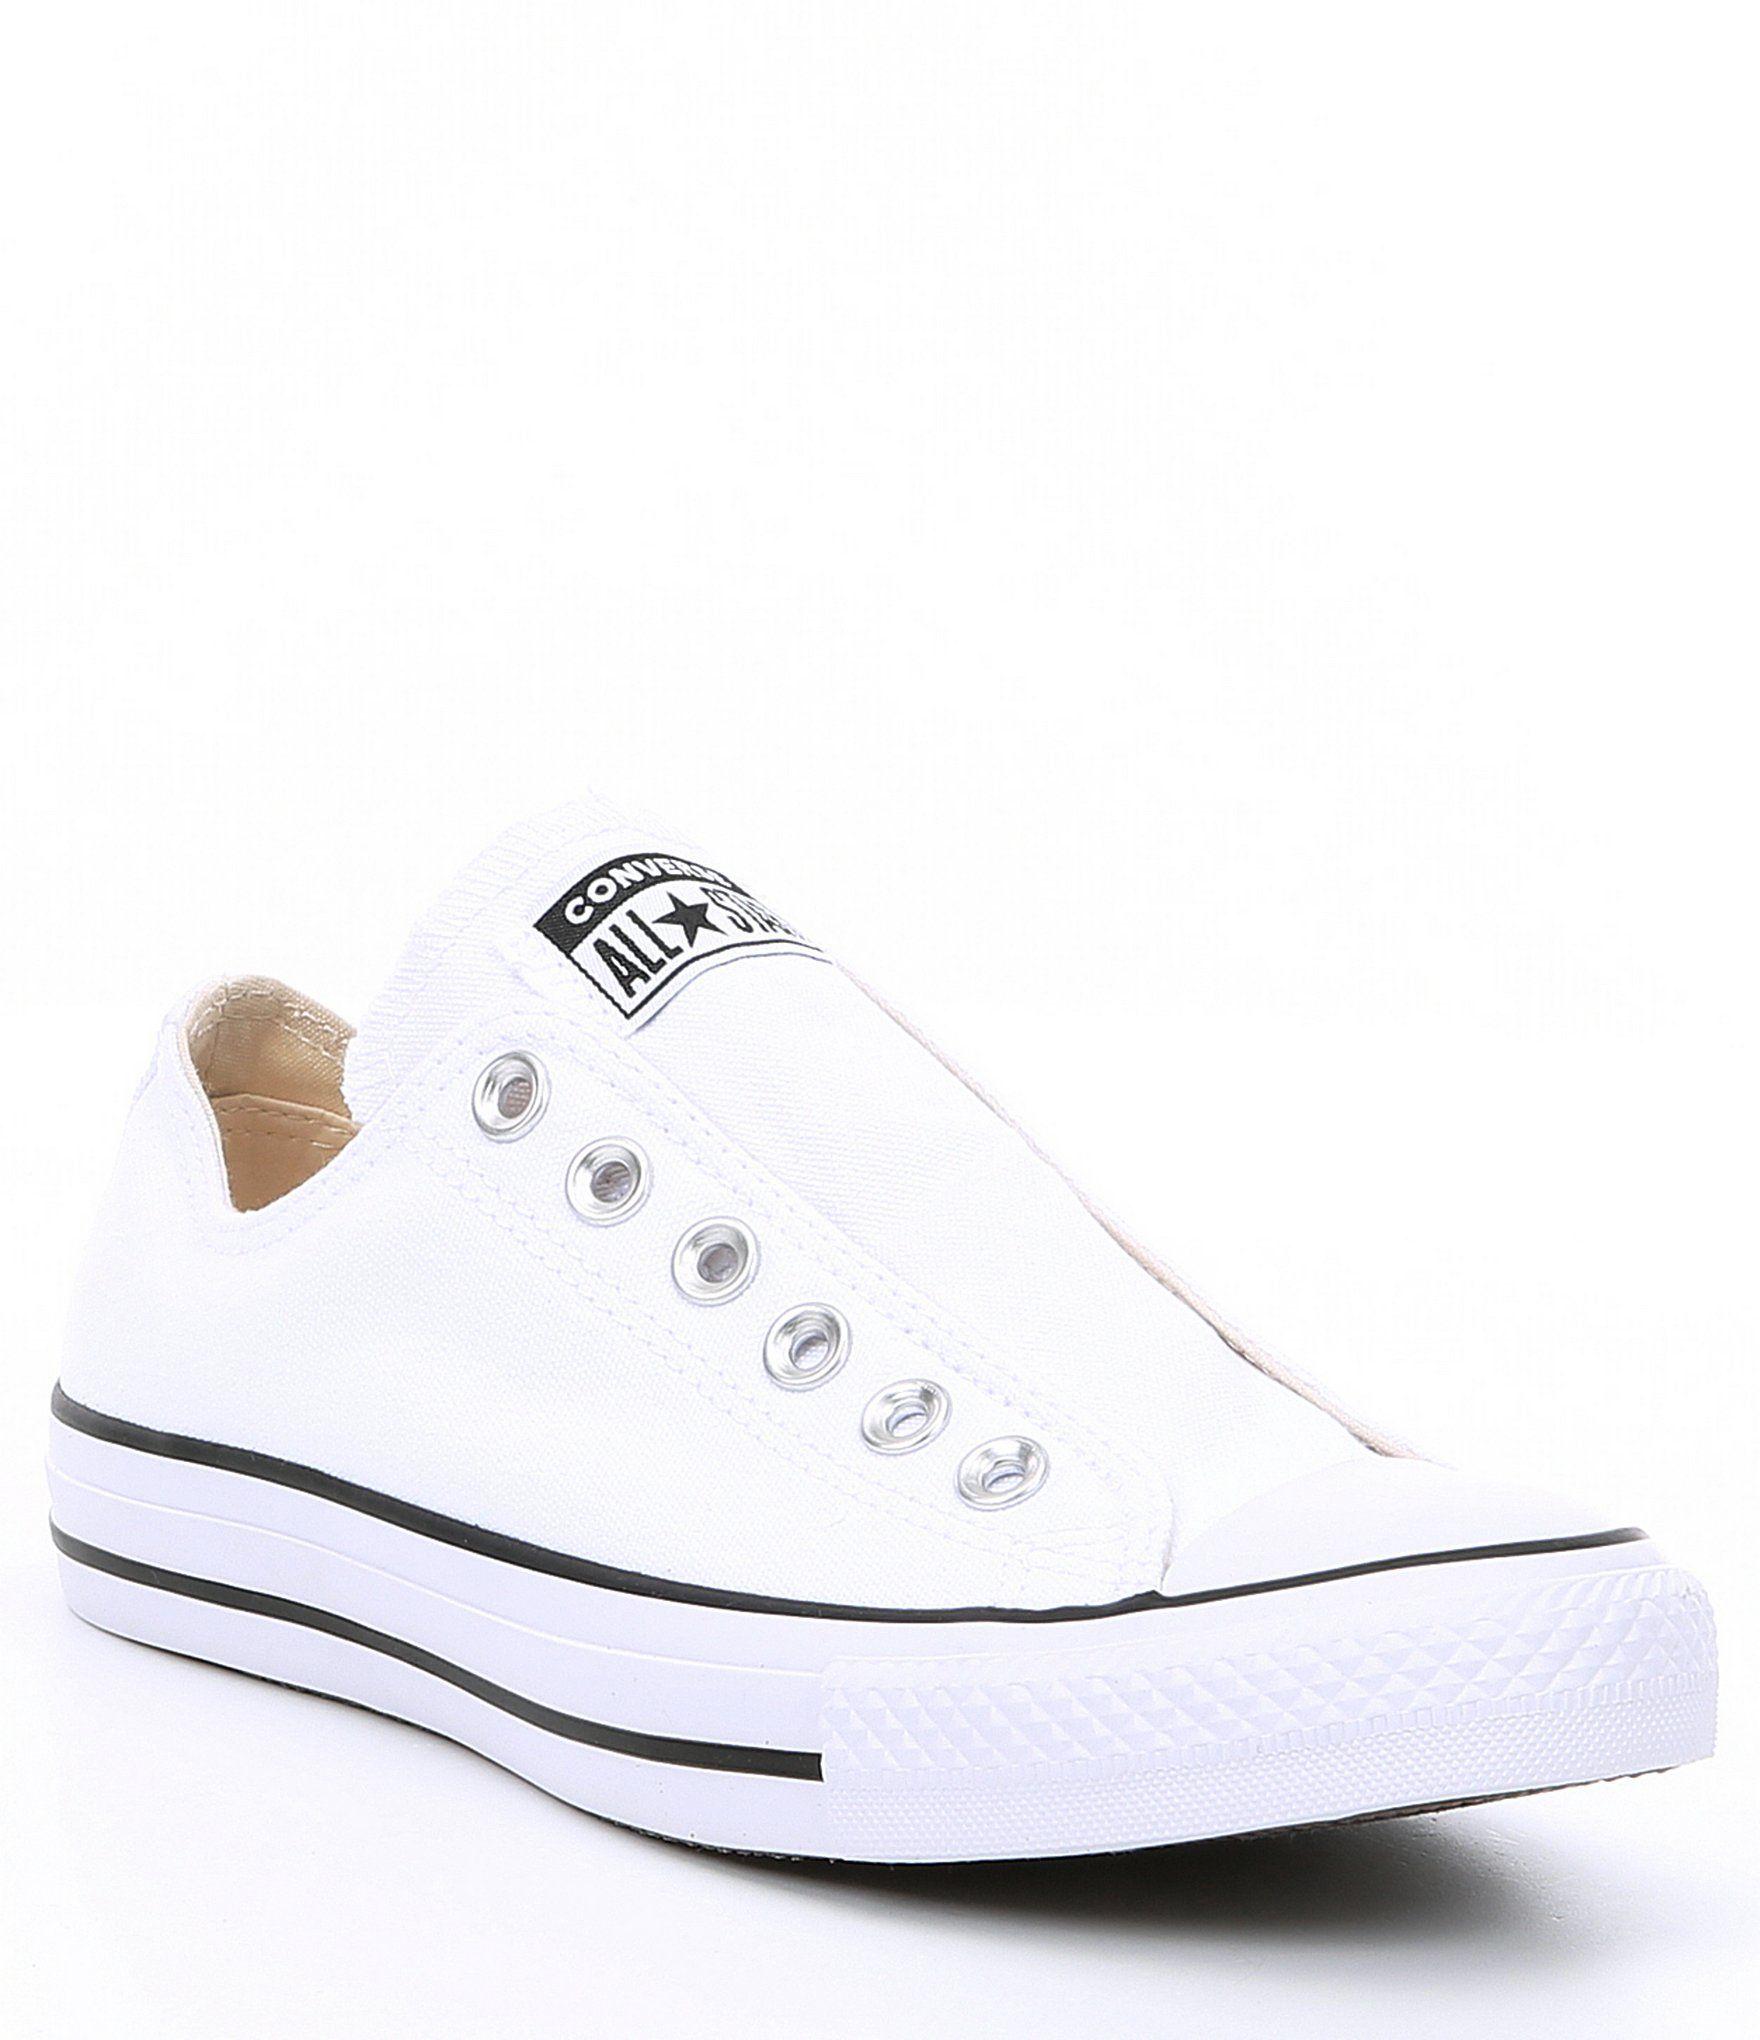 Converse Women's Chuck Taylor All Star Slip On Sneakers - Midnight Turquoise/Black/White 7M #whiteallstars